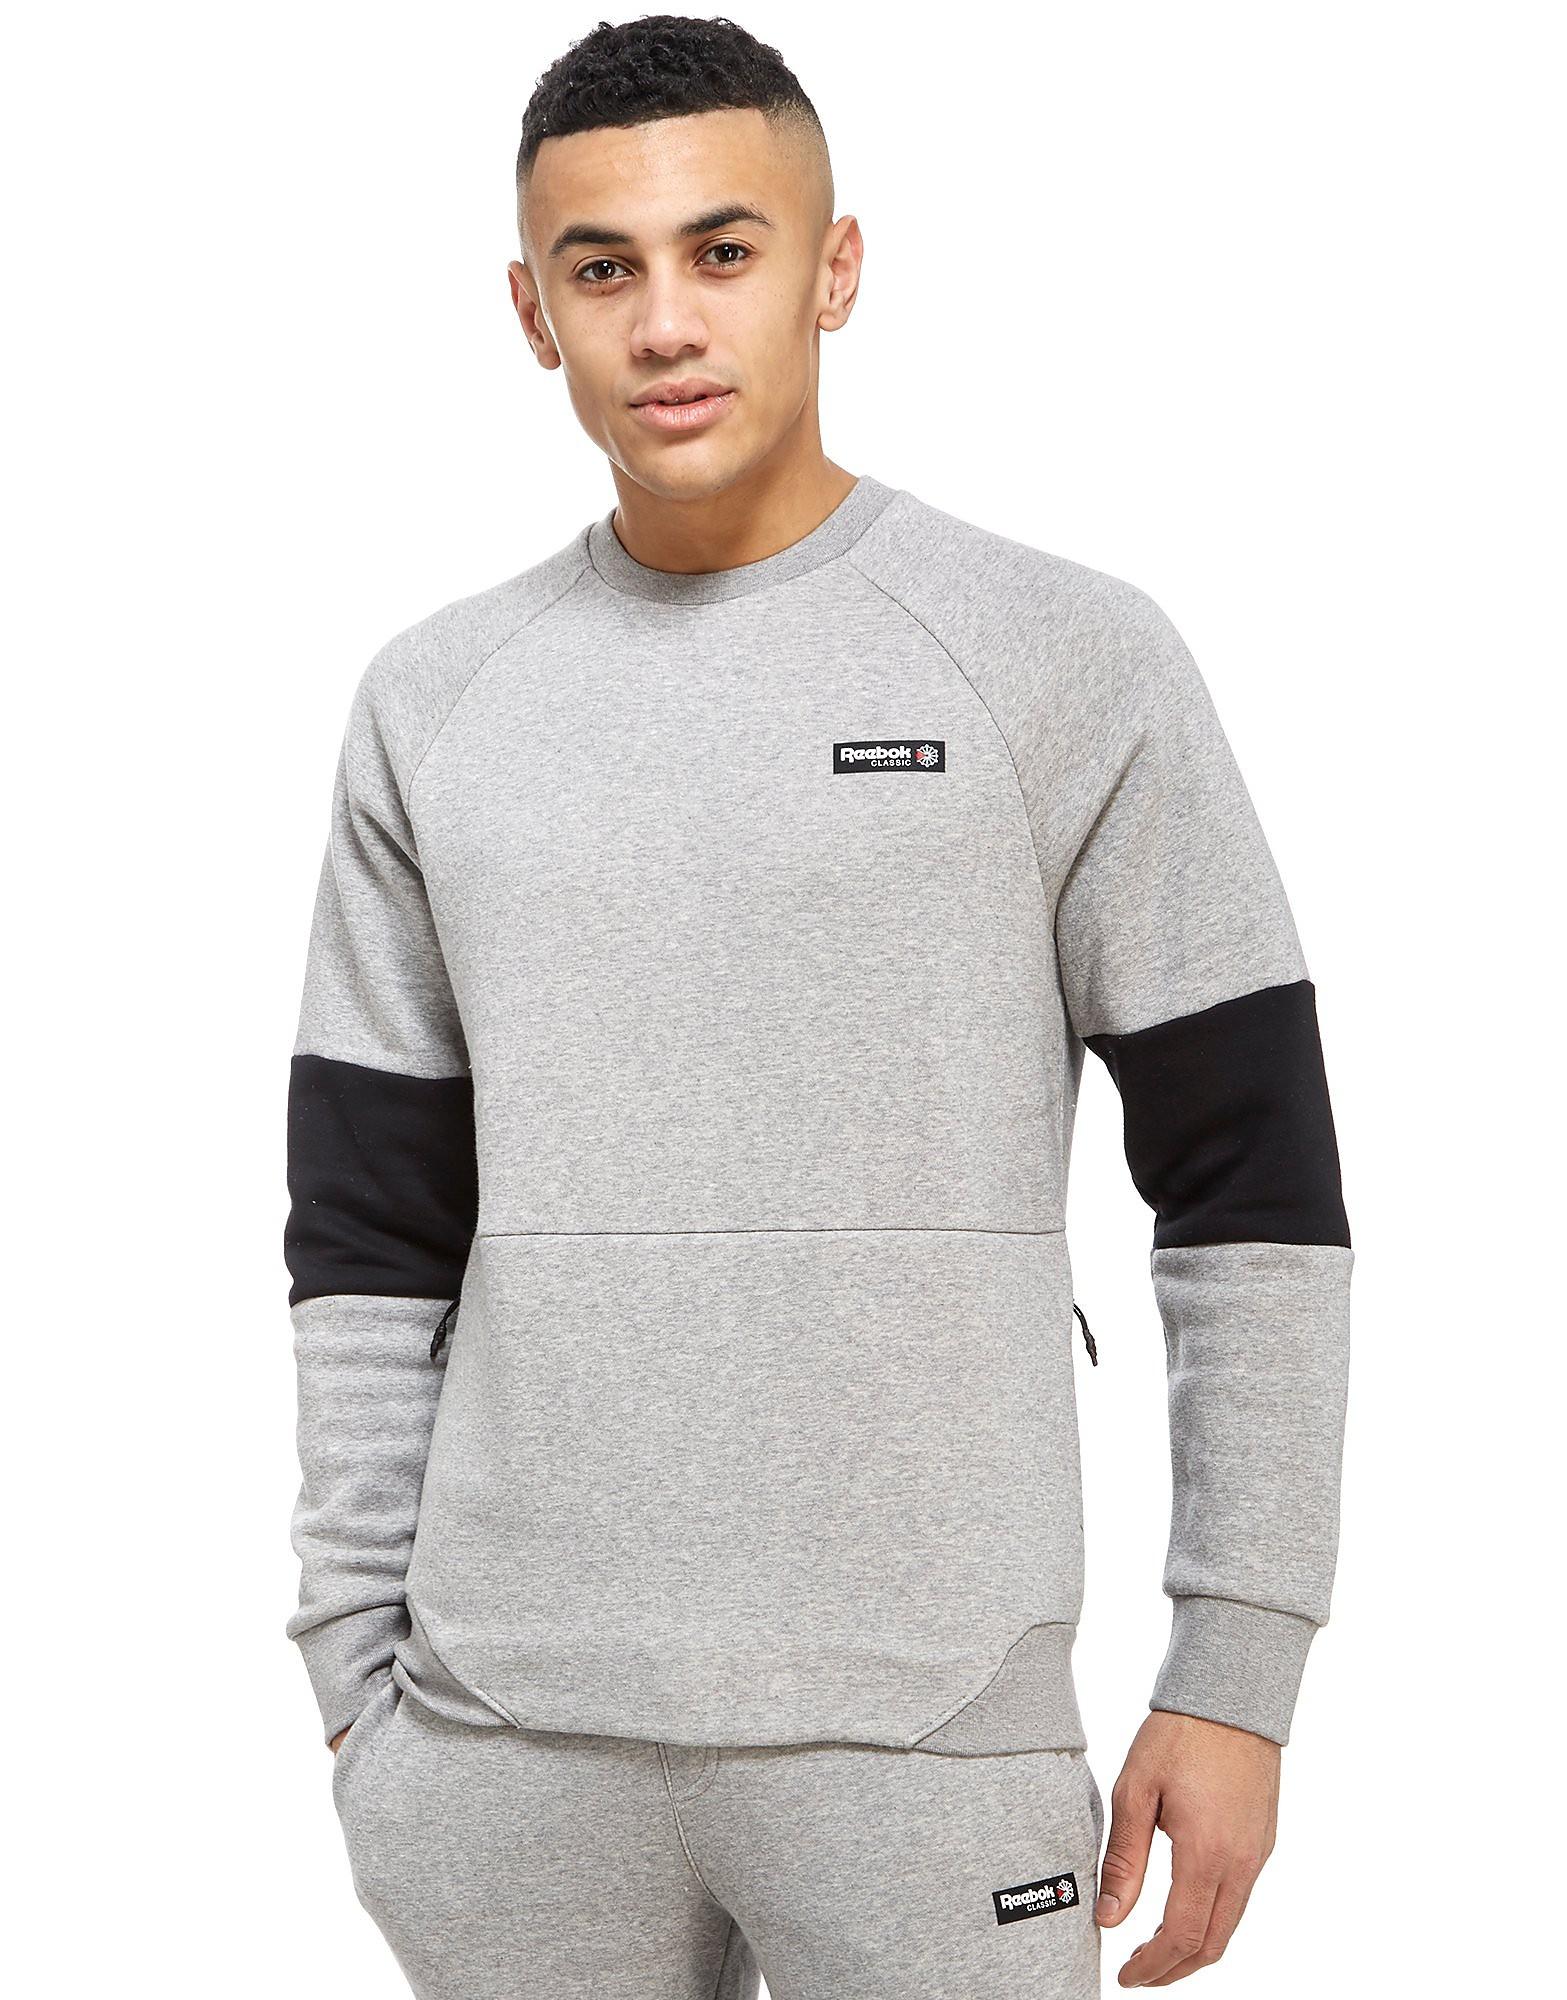 Reebok Classic Pocket Sweatshirt